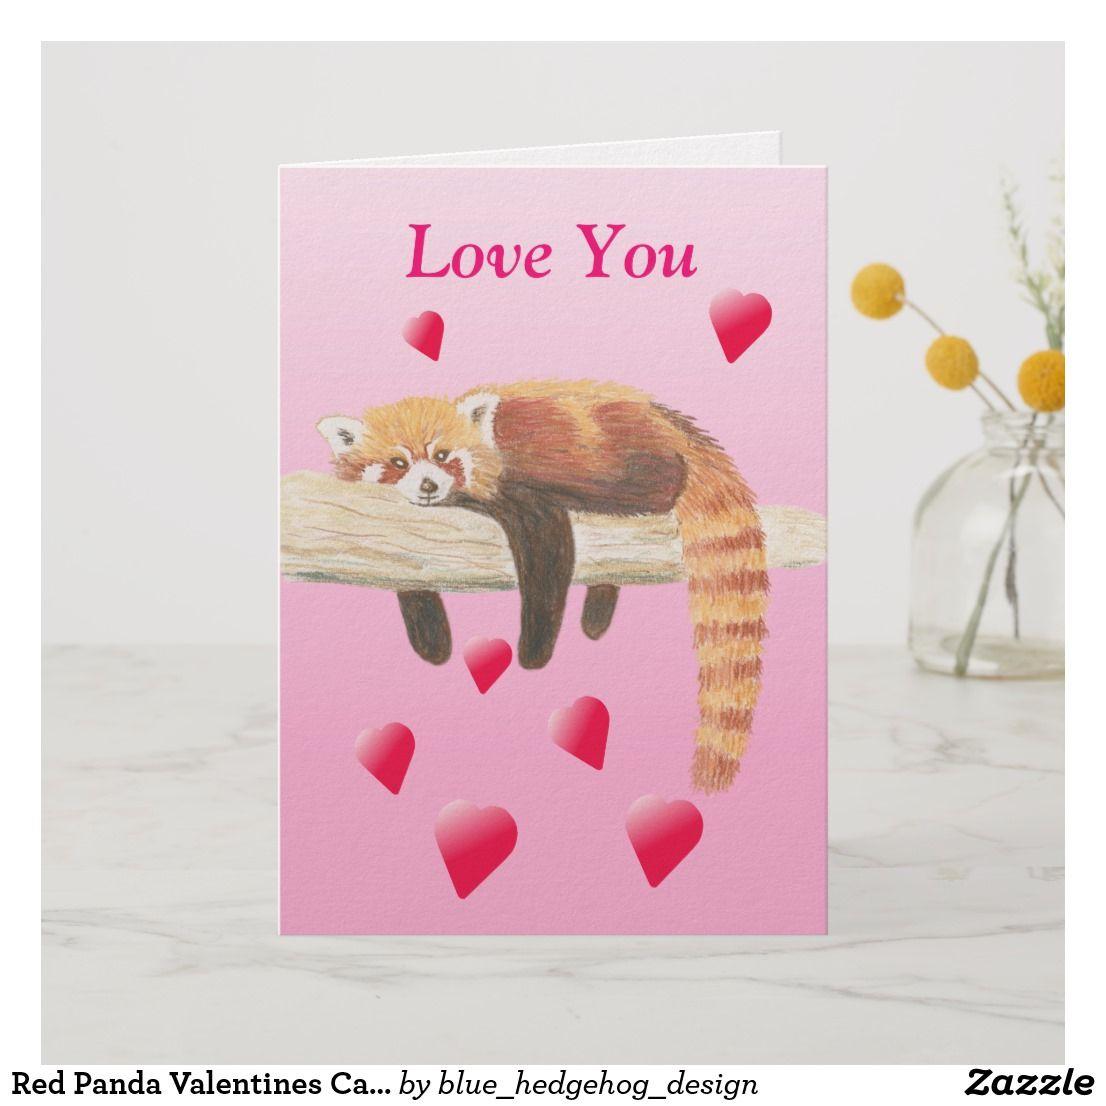 Red Panda Valentines Card